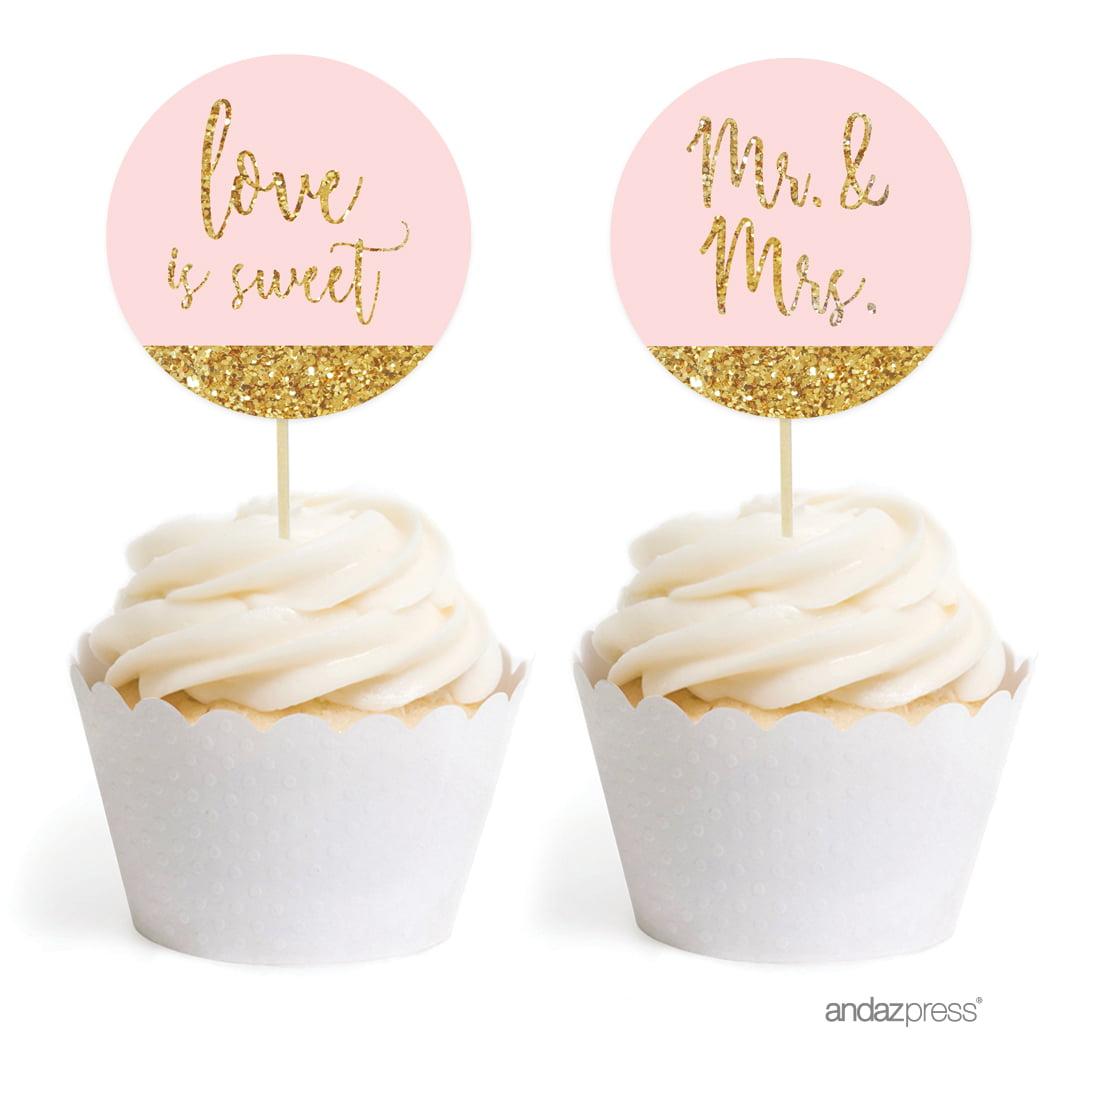 Blush Pink Gold Glitter Print Wedding Round Cupcake Topper DIY Party Favors Kit, 20-Pack